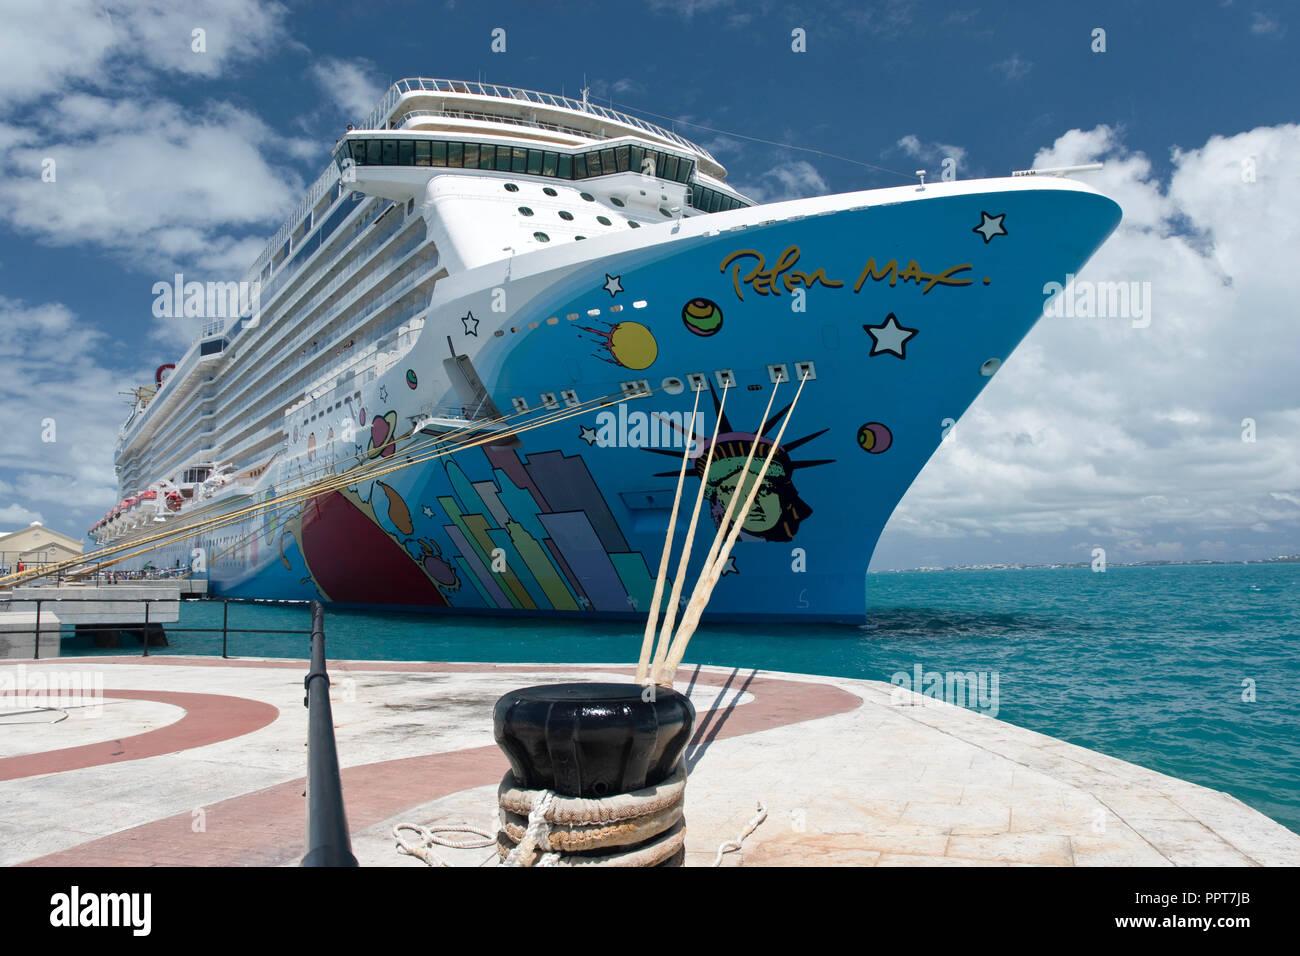 The Norwegian Breakaway cruise ship moored at Kings Wharf, at the dockyard in Bermuda. - Stock Image